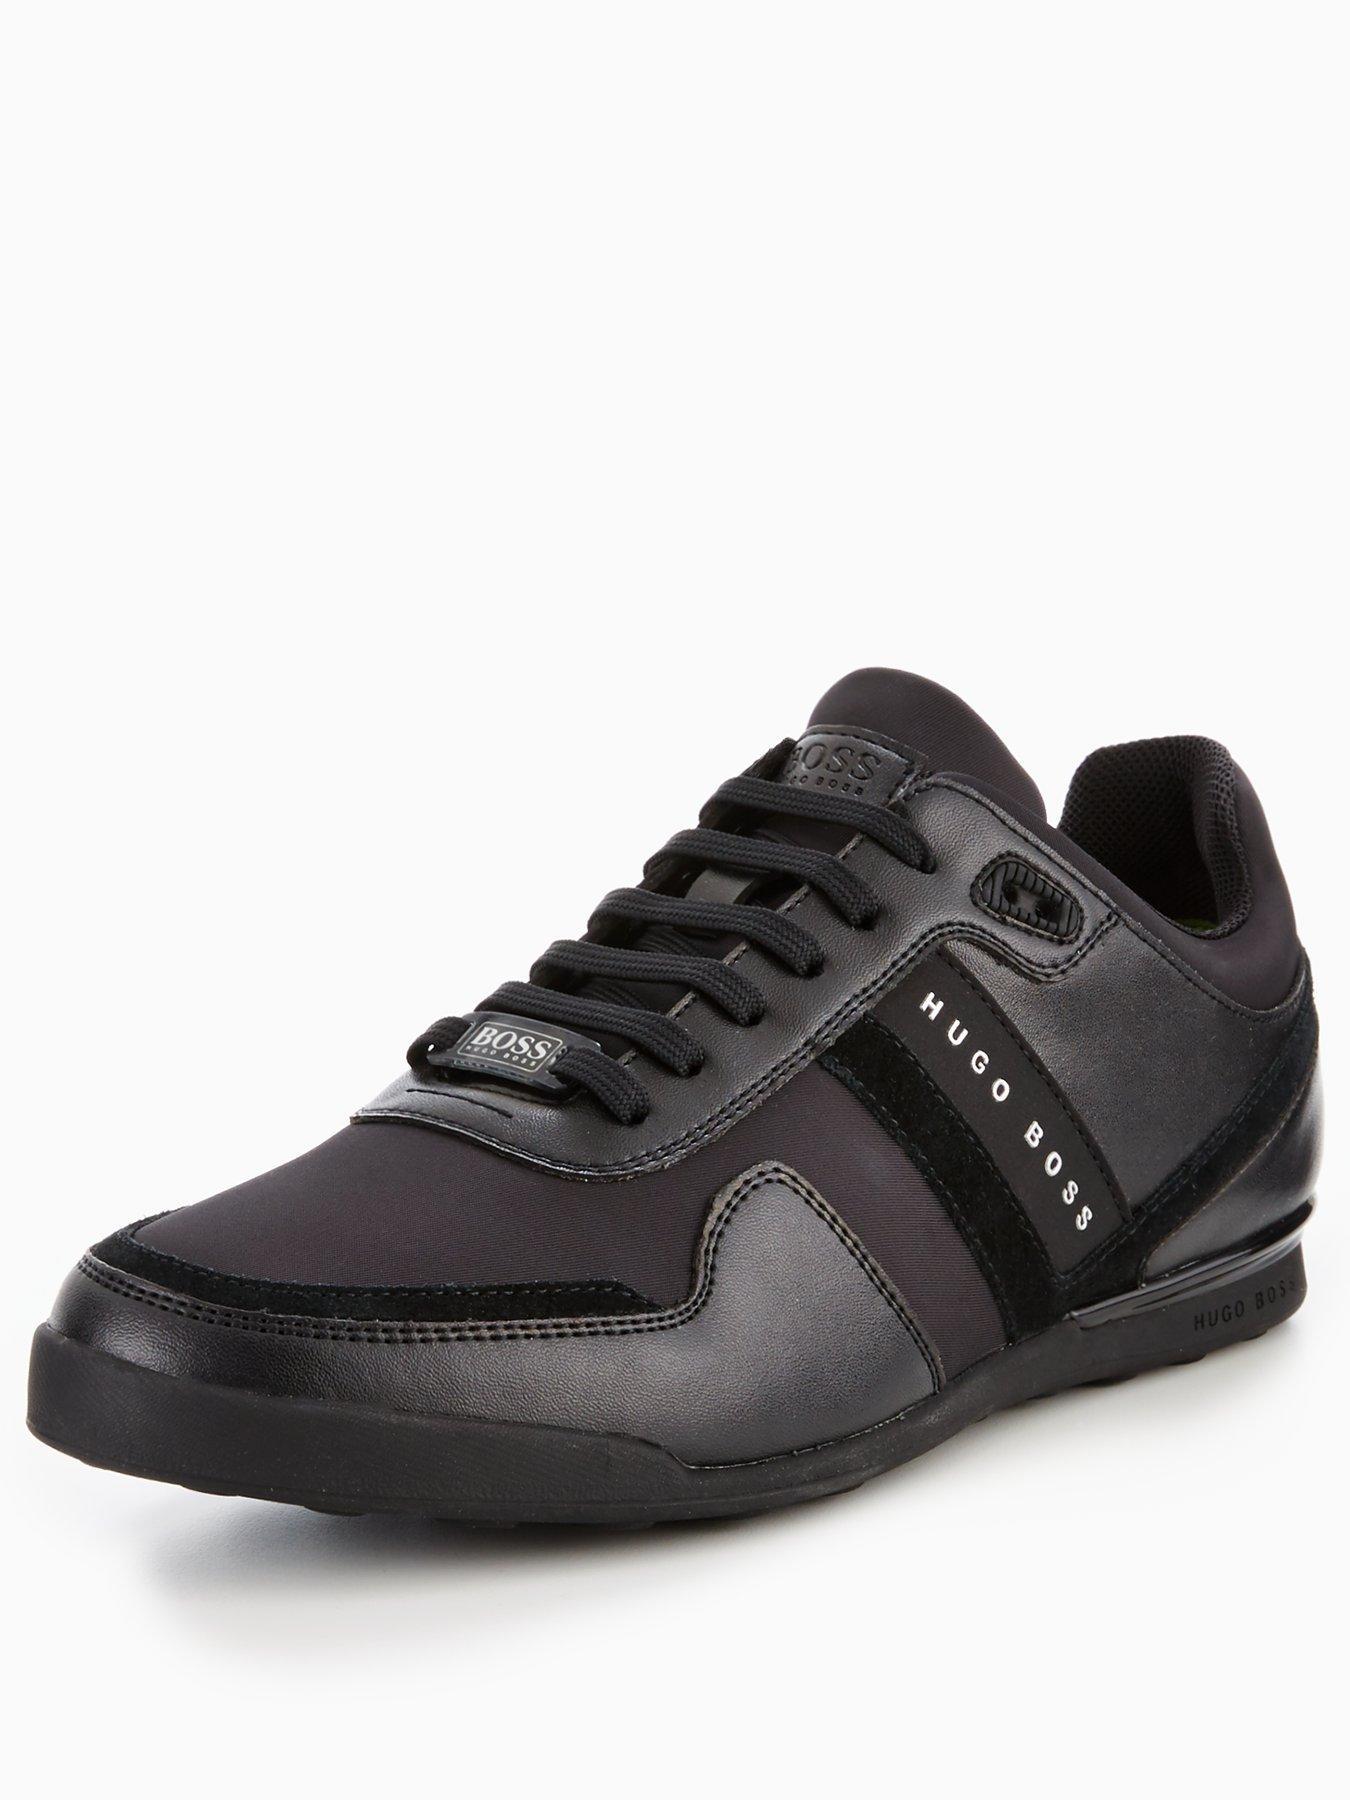 Hugo Boss GREEN ARKANSAS LOW TRAINER 1600173166 Men's Shoes Hugo Boss Trainers